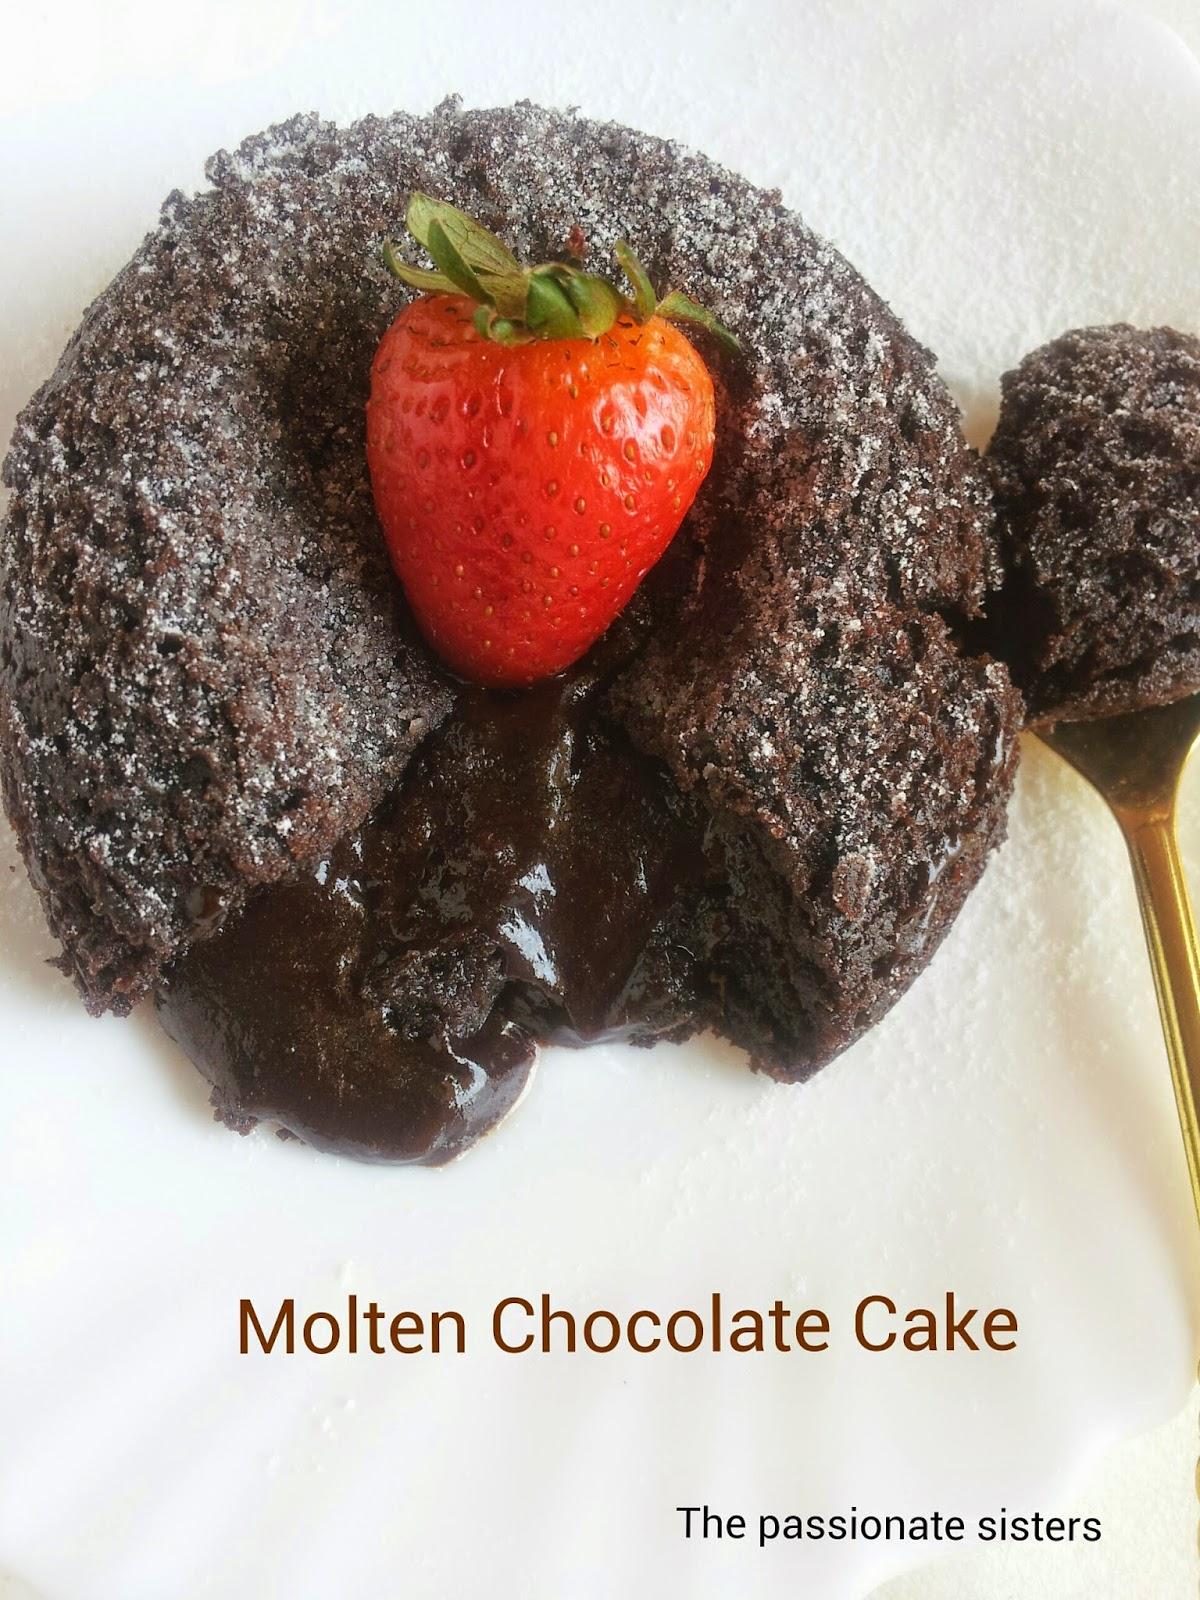 Eggless chocolava cake / molten chocolate cake / chocolate fondant